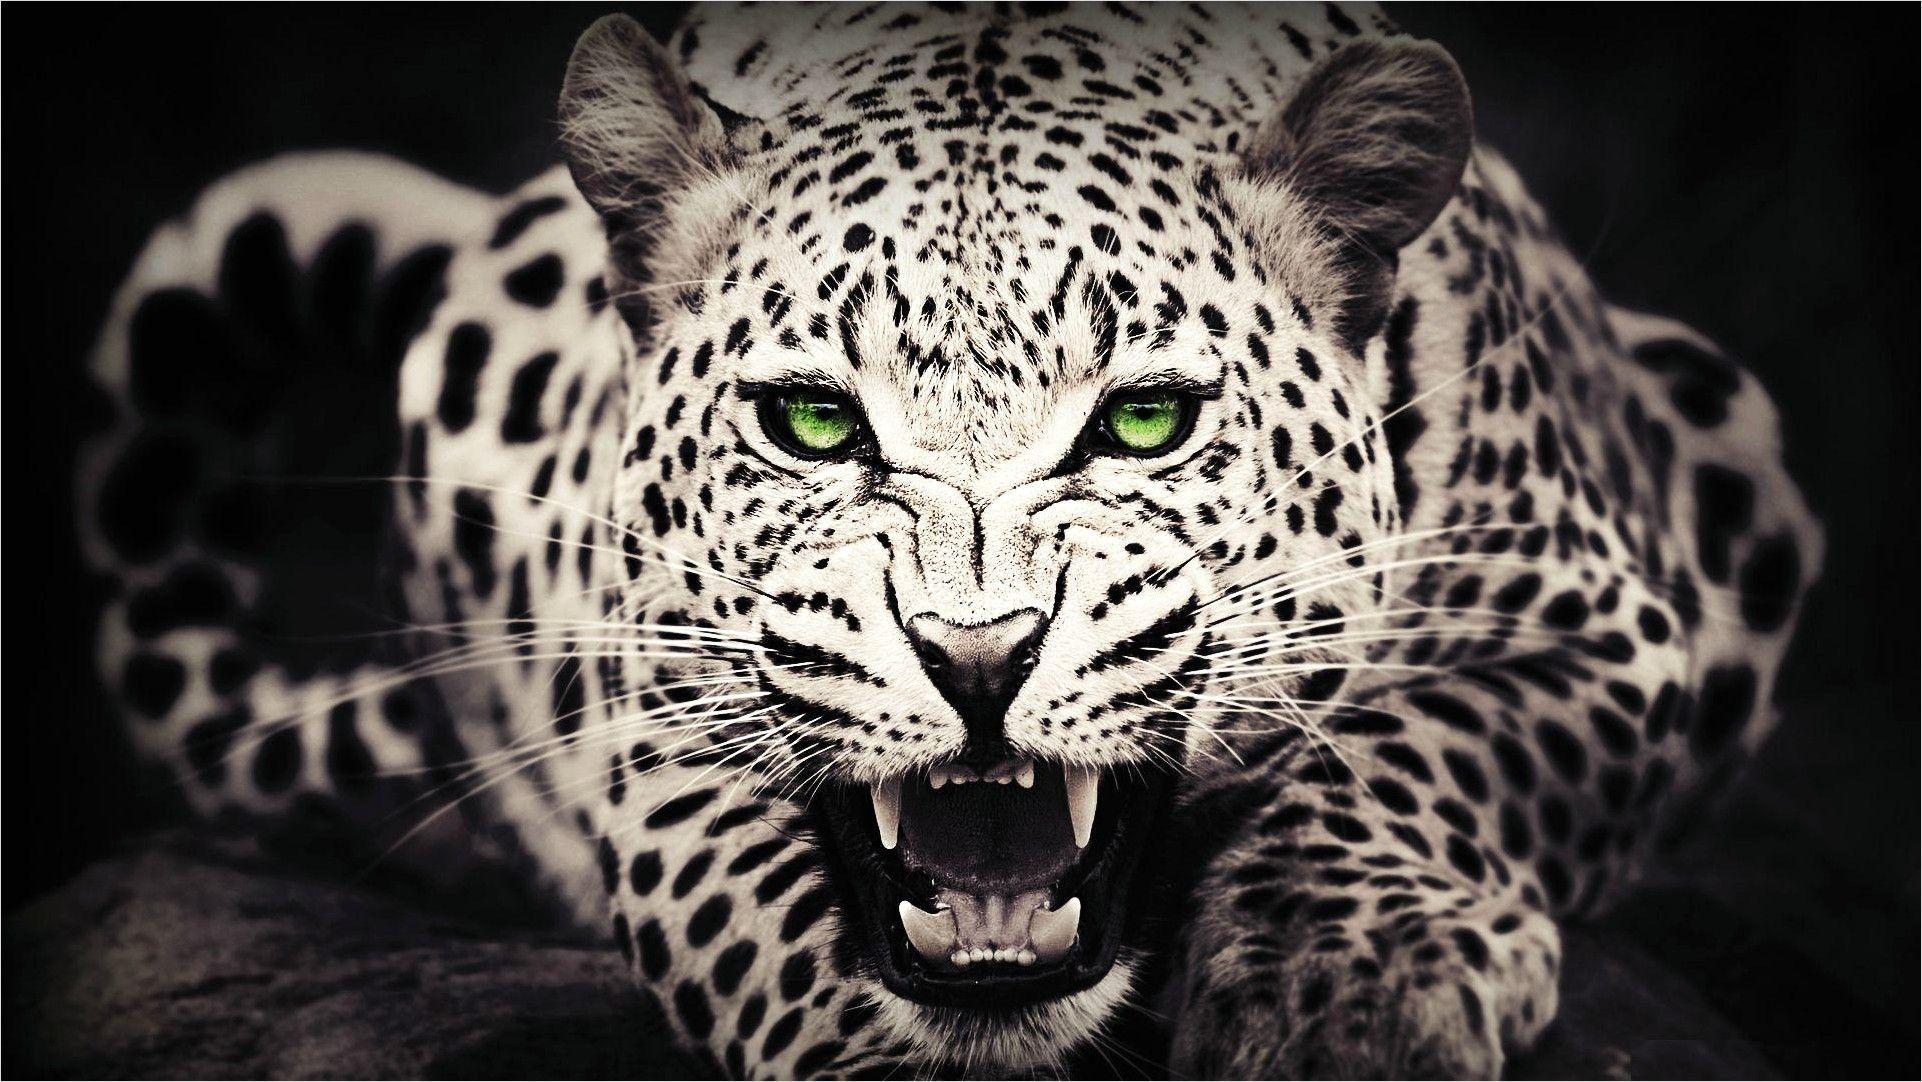 4k Animal Wallpaper For Laptop in 2020 Cheetah wallpaper